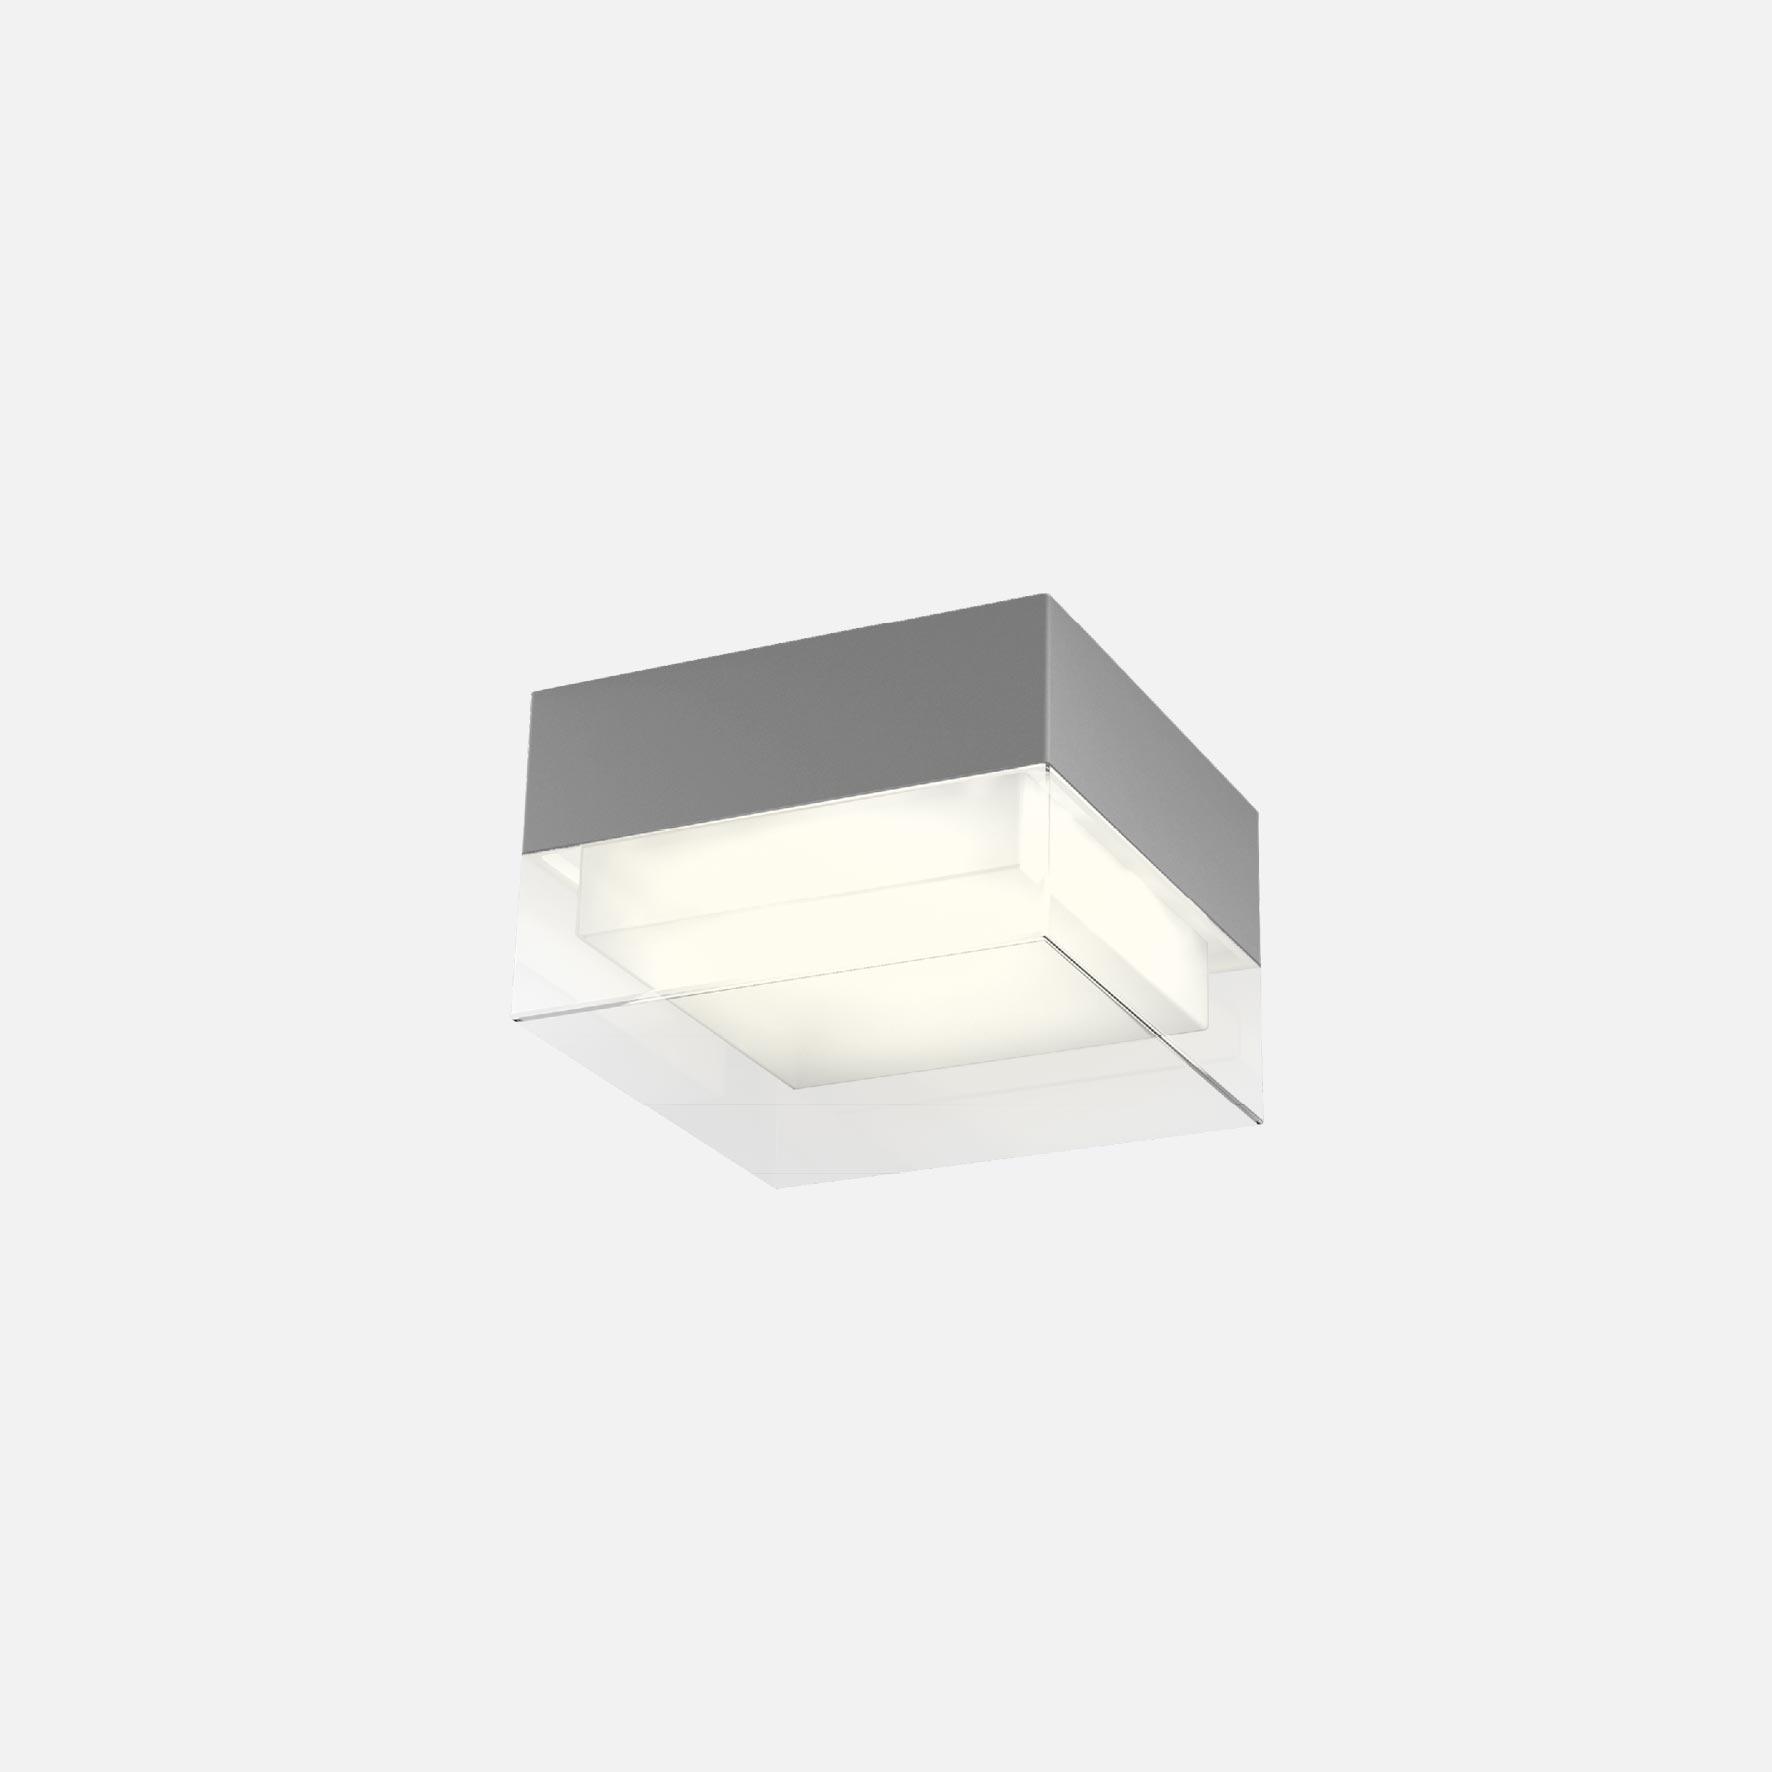 Blas 2.0 led dark grey texture